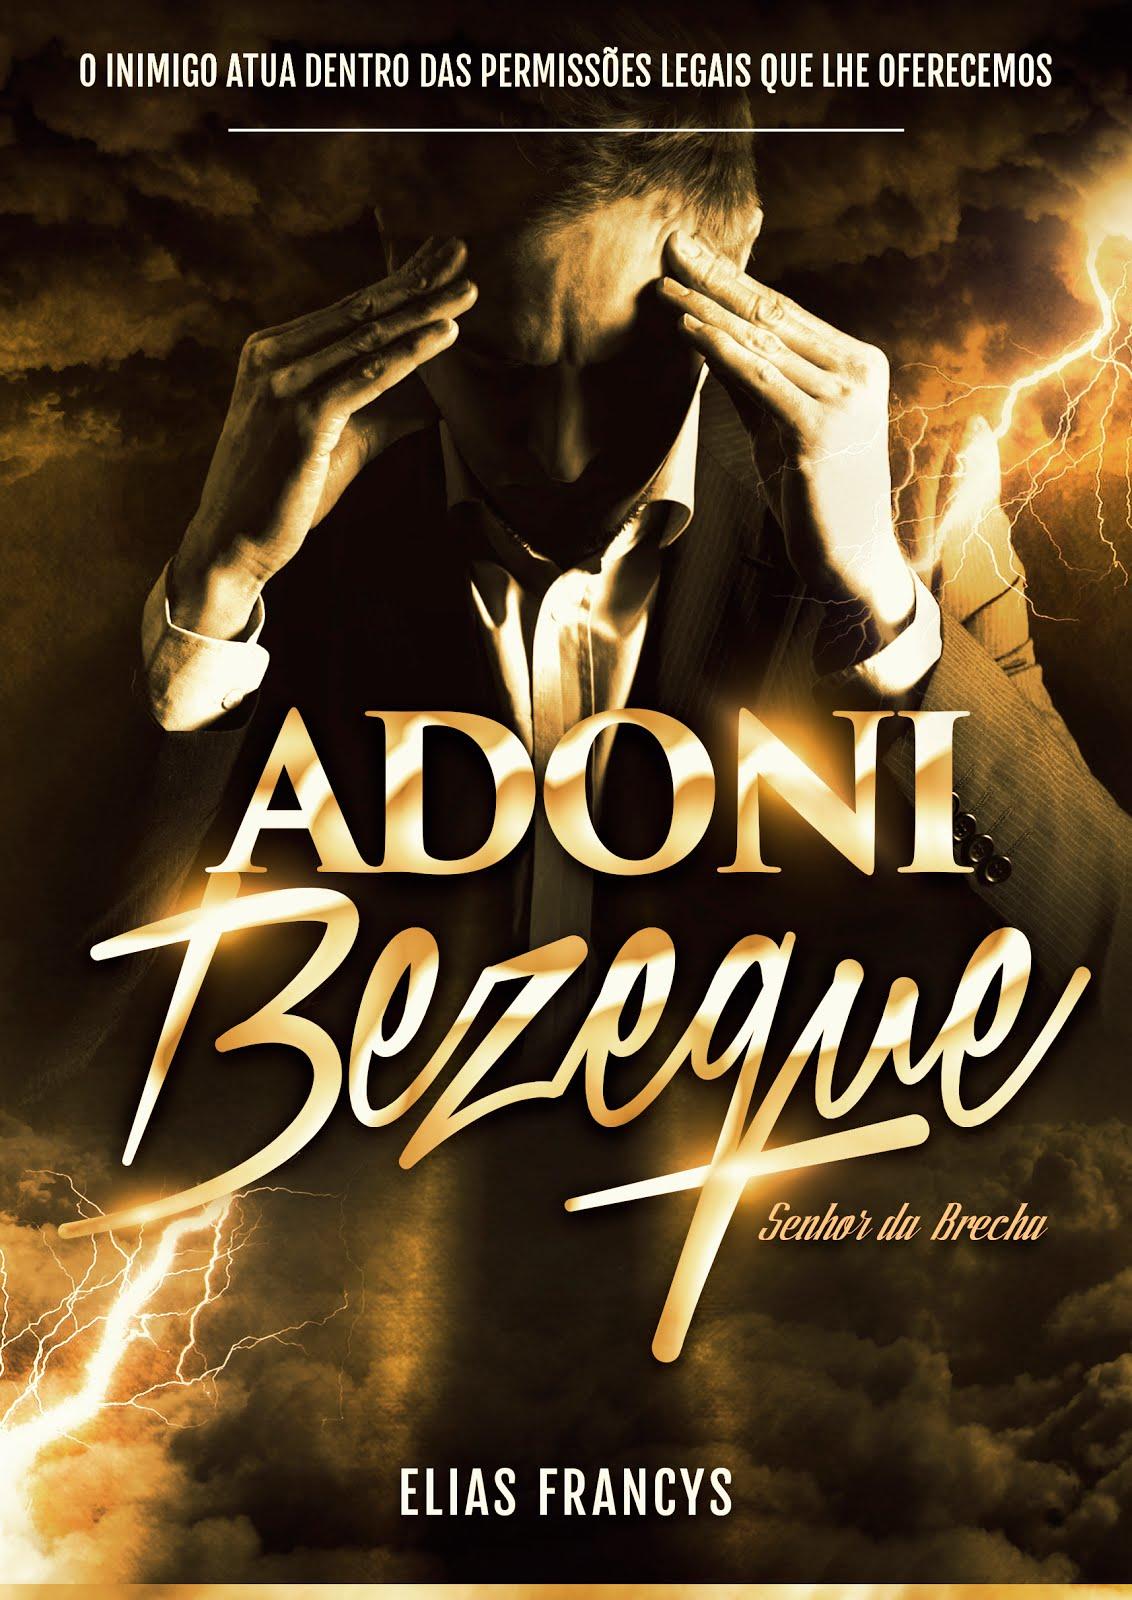 Adonai Bezeque - senhor da brecha